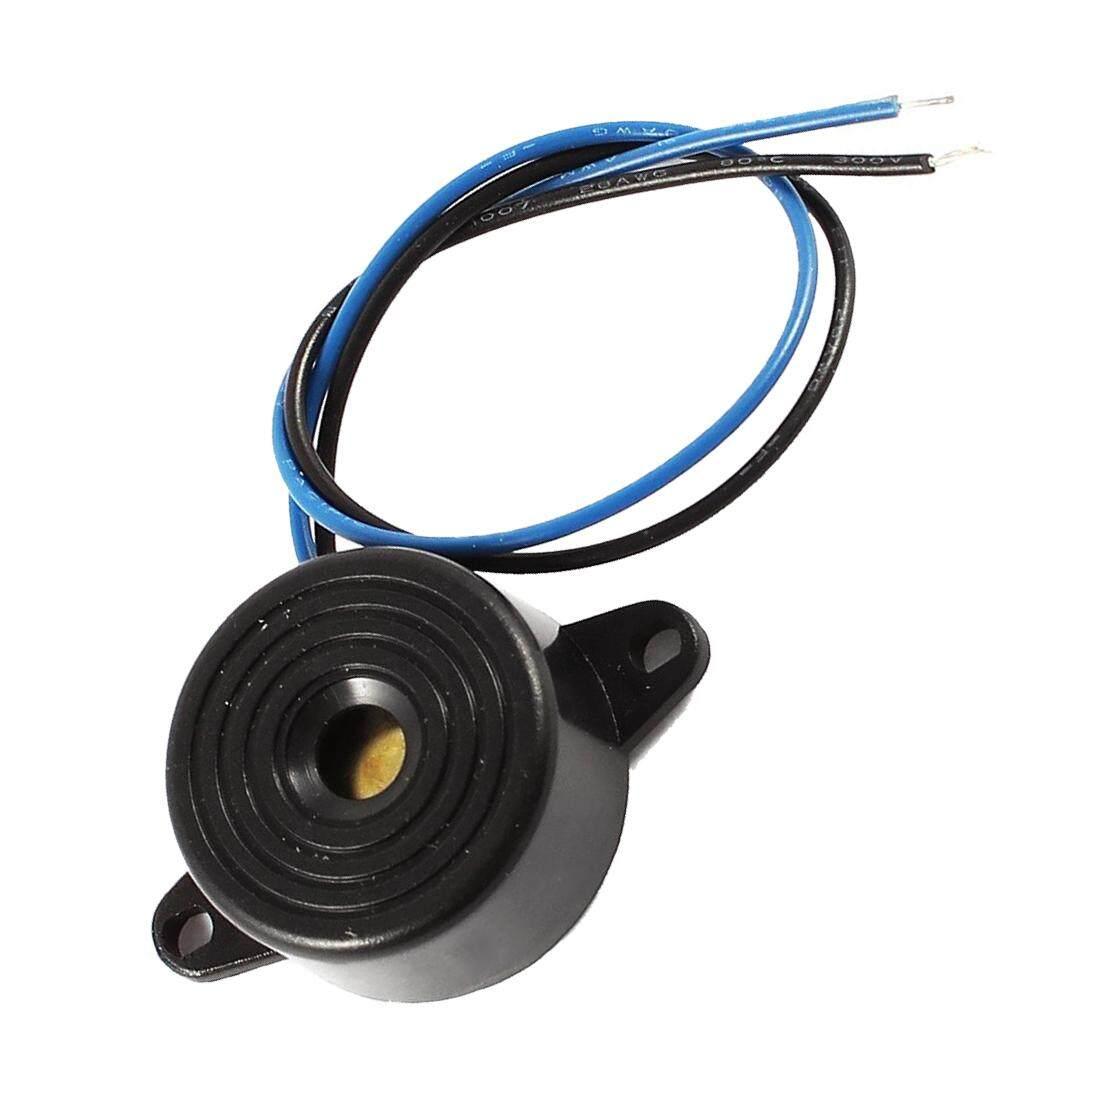 Detail Gambar Industrial Sound Electronic Buzzer Sounder DC 3-24V Black Terbaru